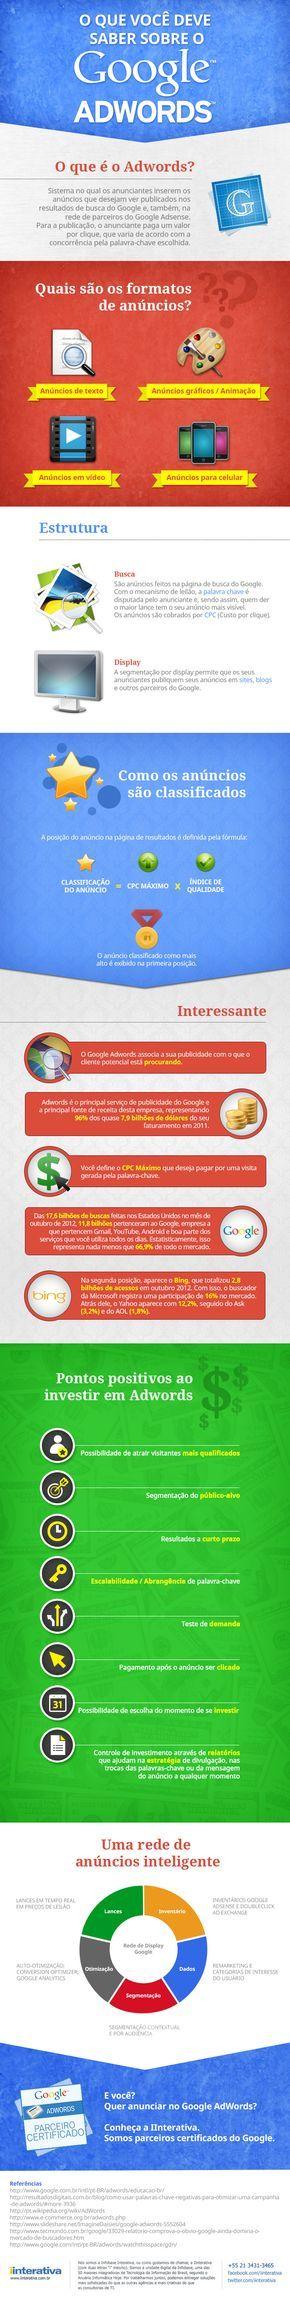 Advertising-Infographics-Como-funciona-o-Google-Adwords Advertising Infographics : Como funciona o Google Adwords?